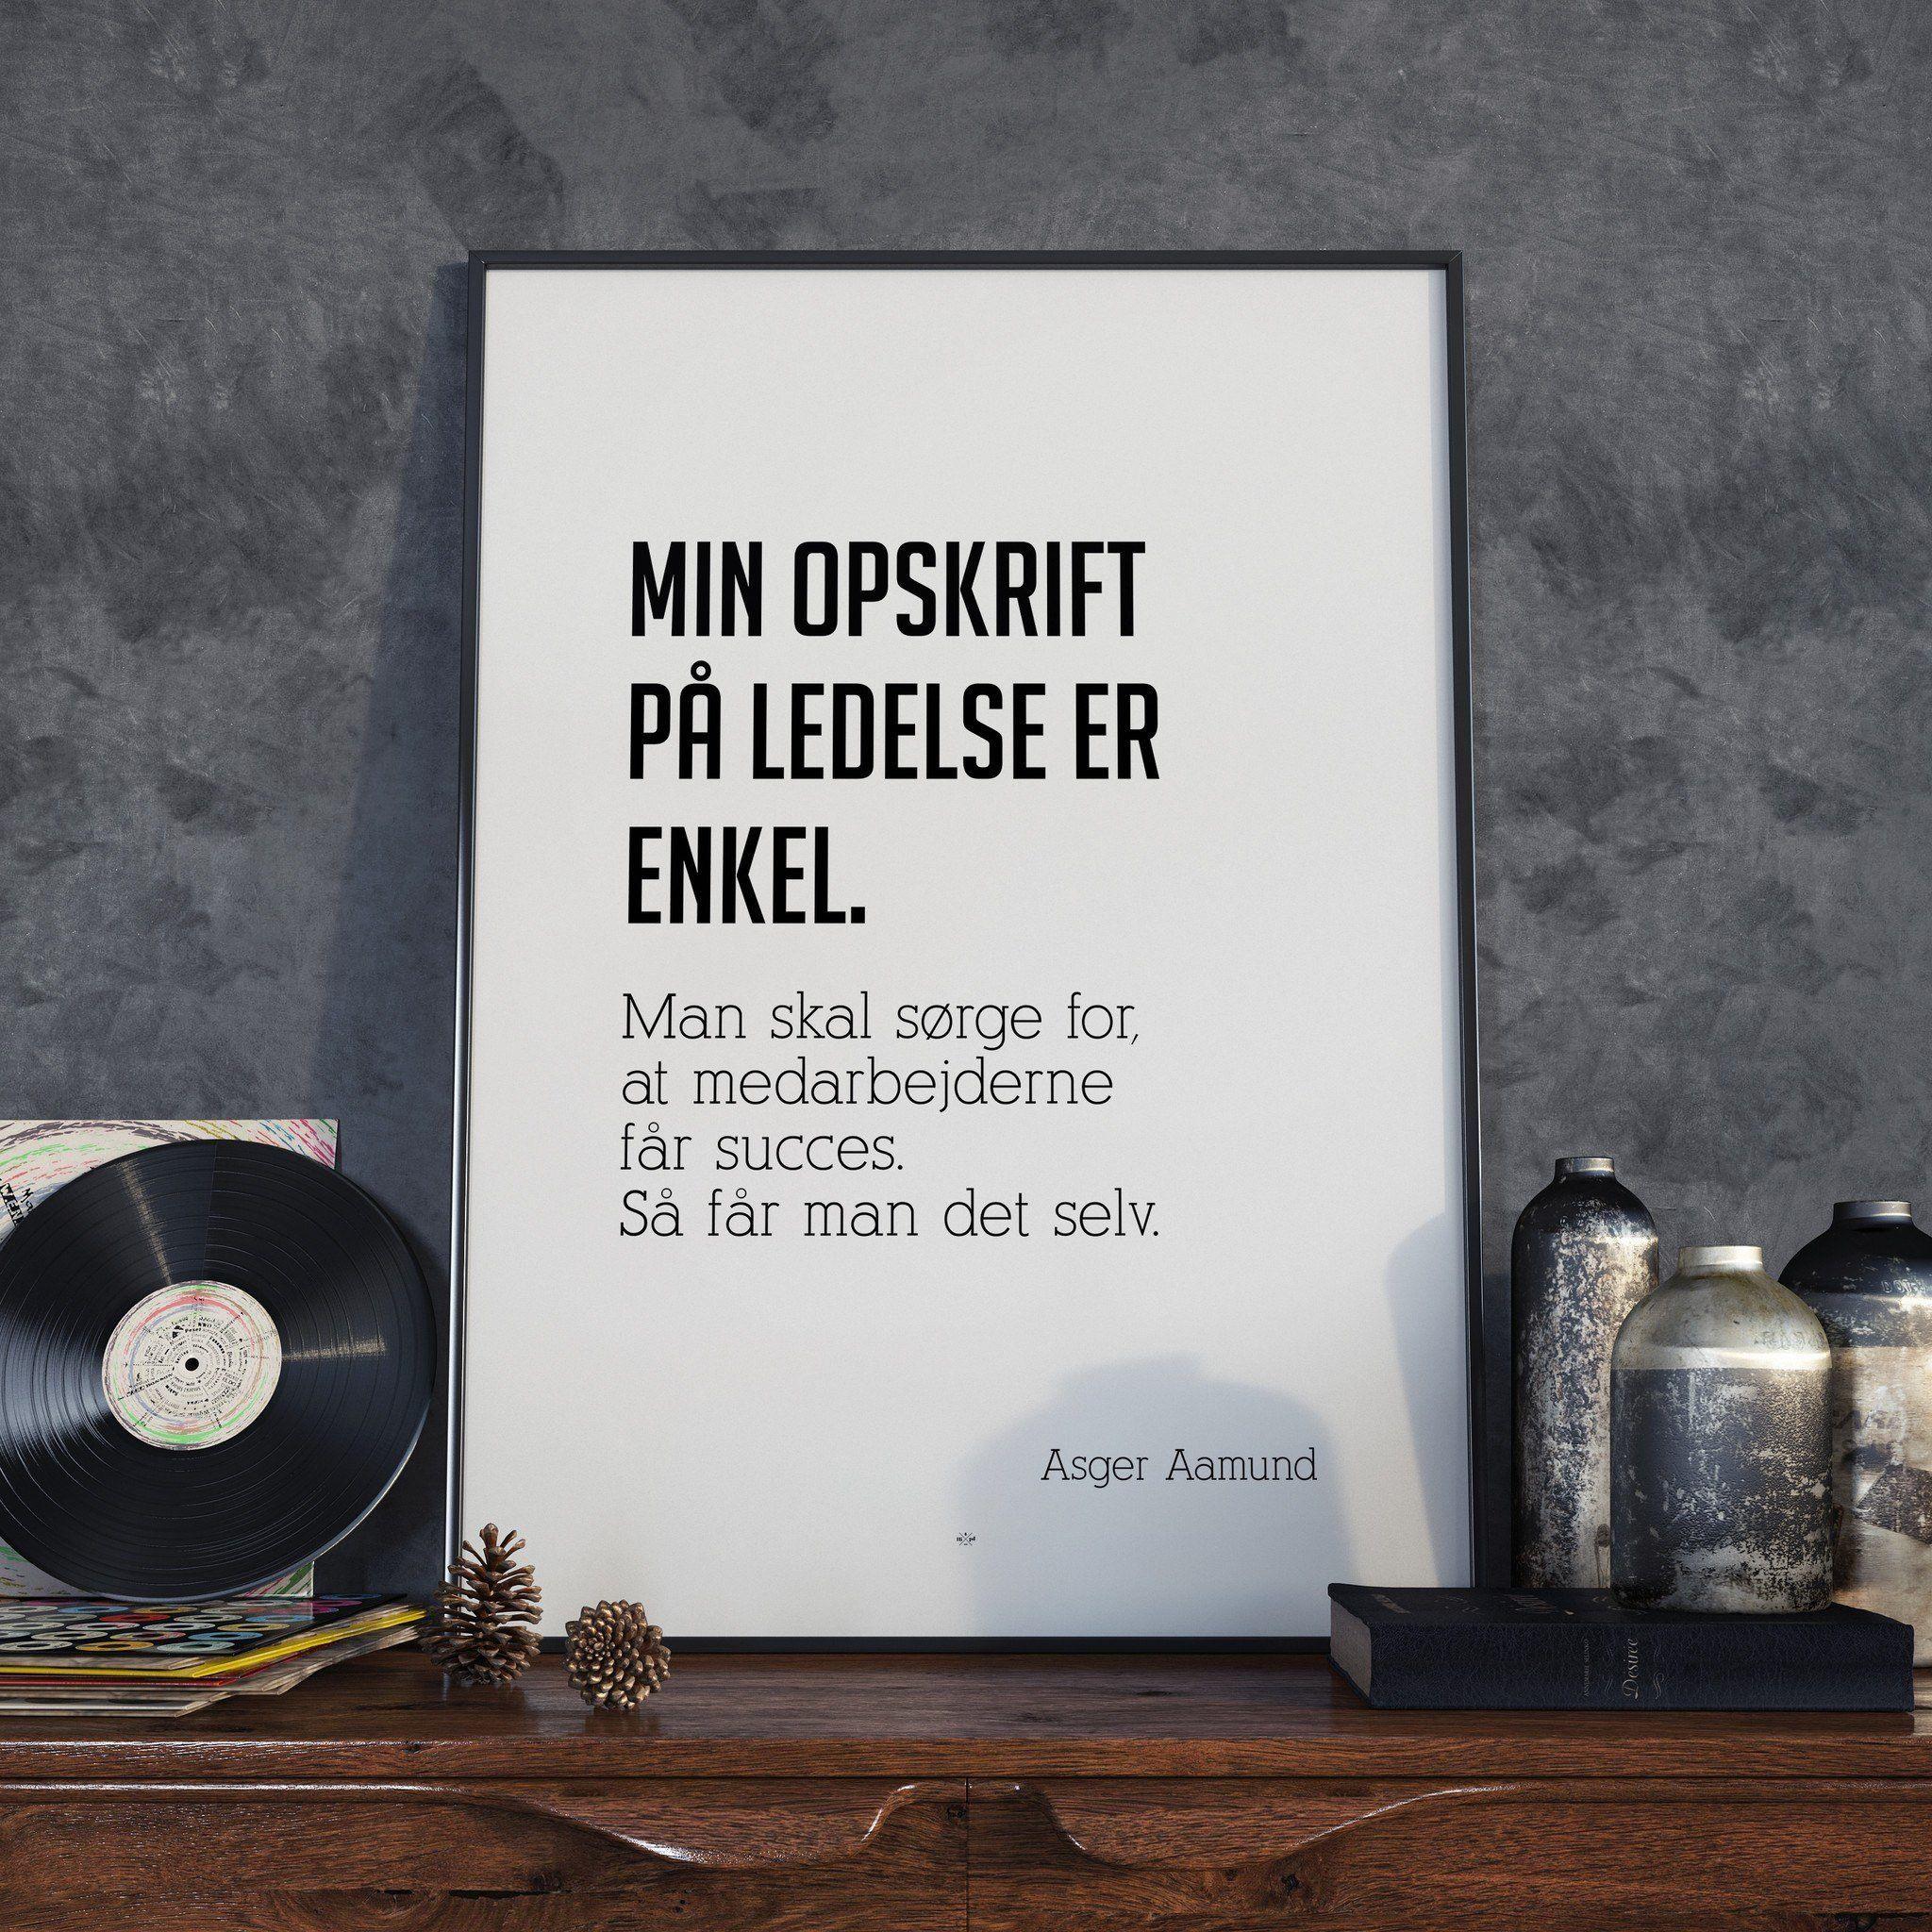 Asger Aamund Citat Plakat Hipd Staerke Citater Humoristiske Citater Motiverende